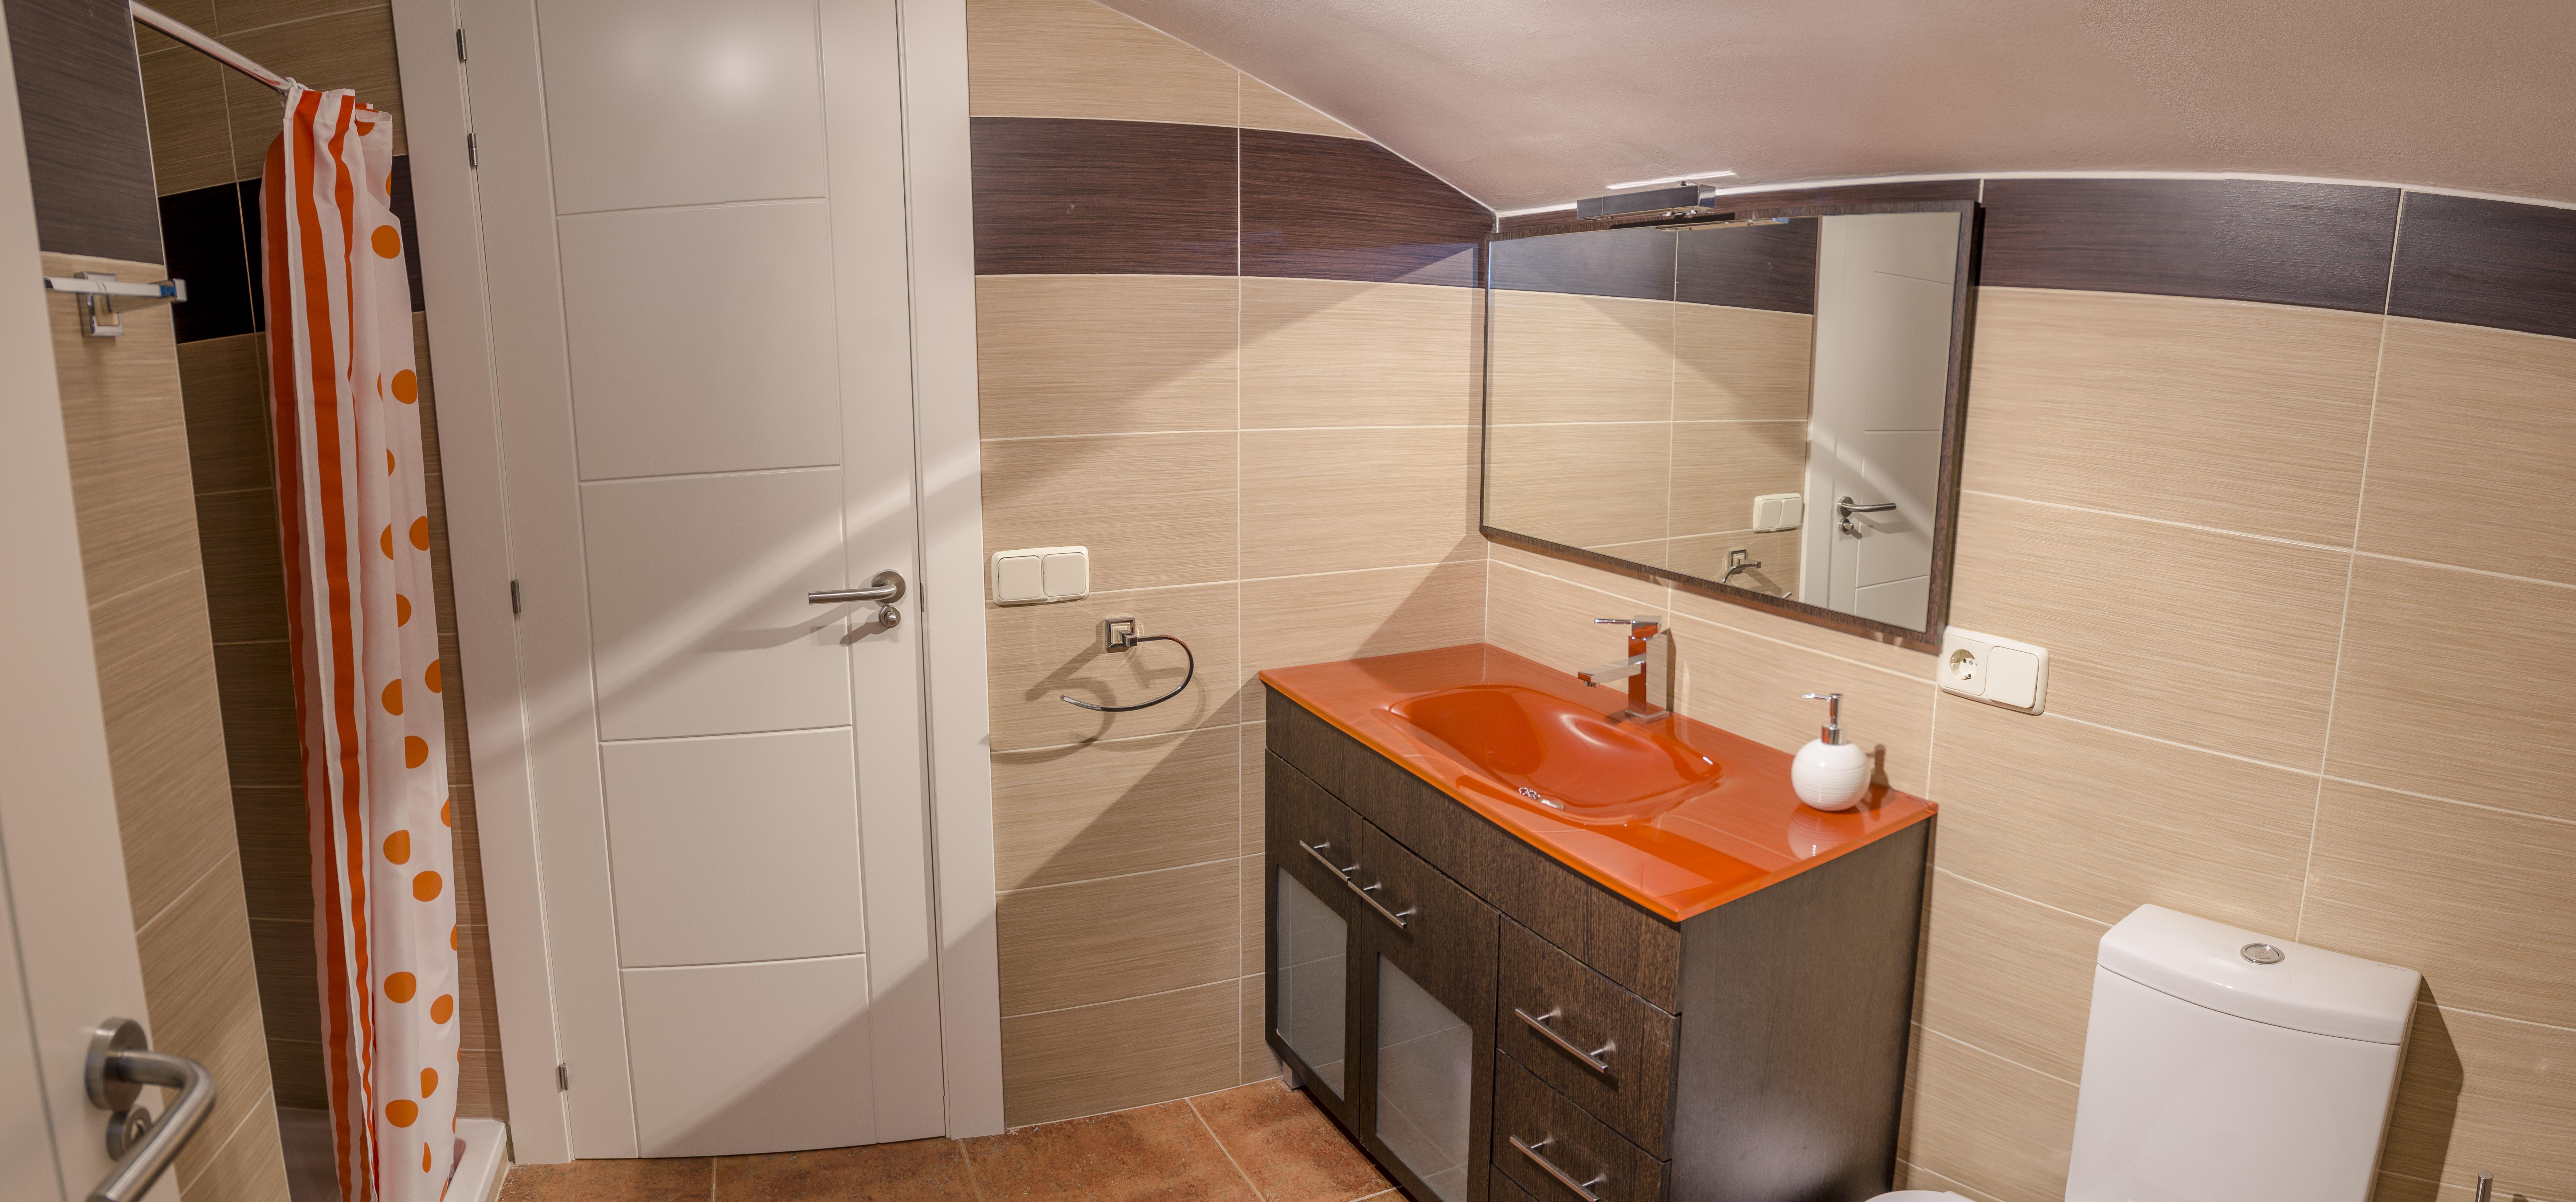 baño 4.jpg